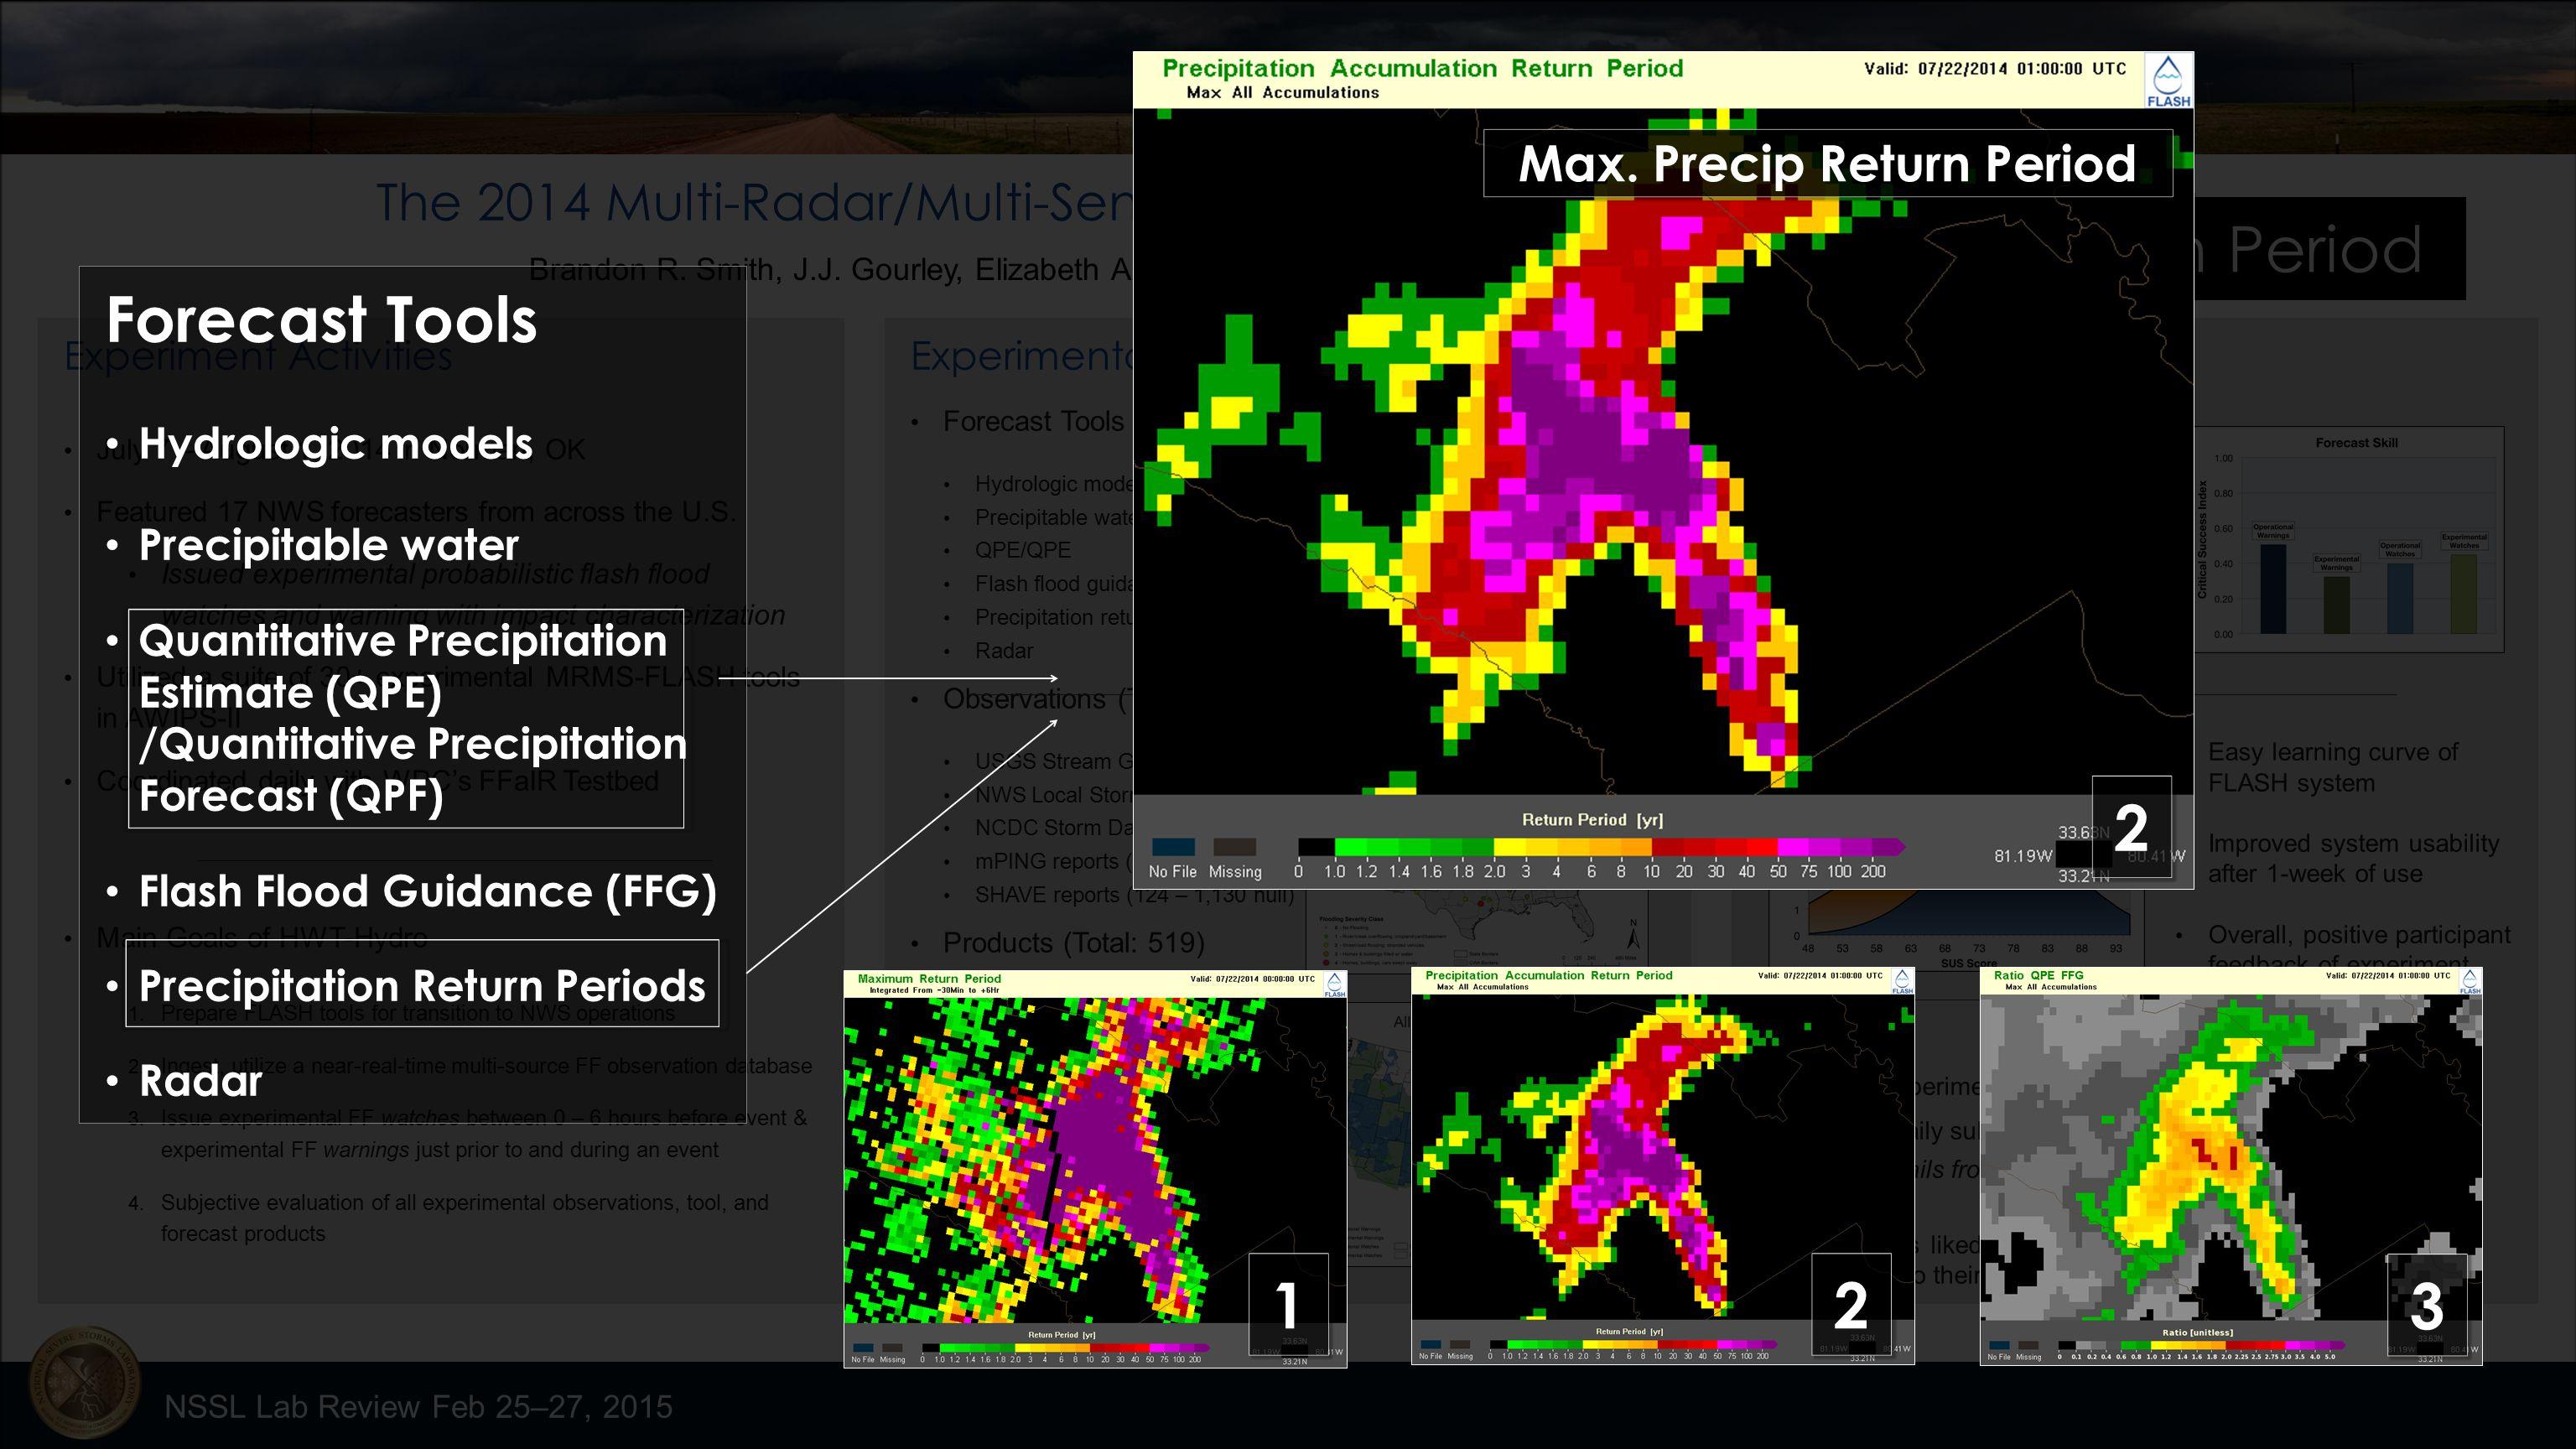 The 2014 Multi-Radar/Multi-Sensor (MRMS) HWT-Hydro Testbed Experiment